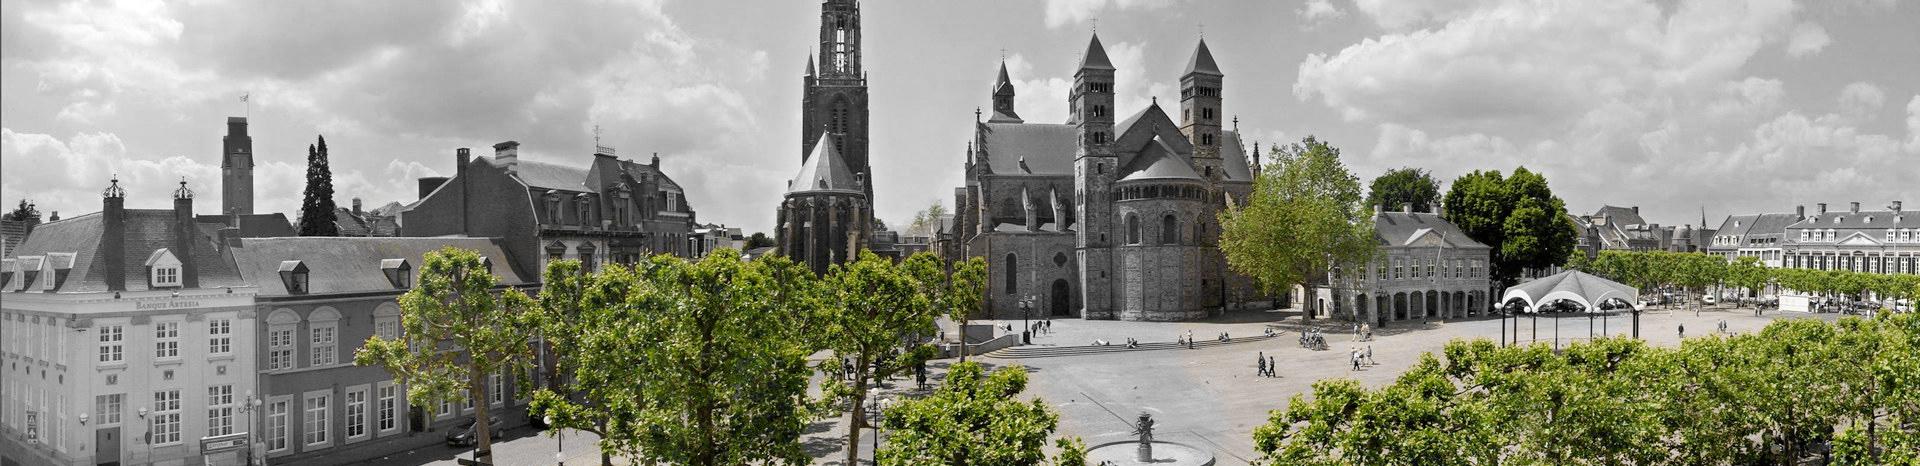 Letselschade advocaat Maastricht | LetselPro